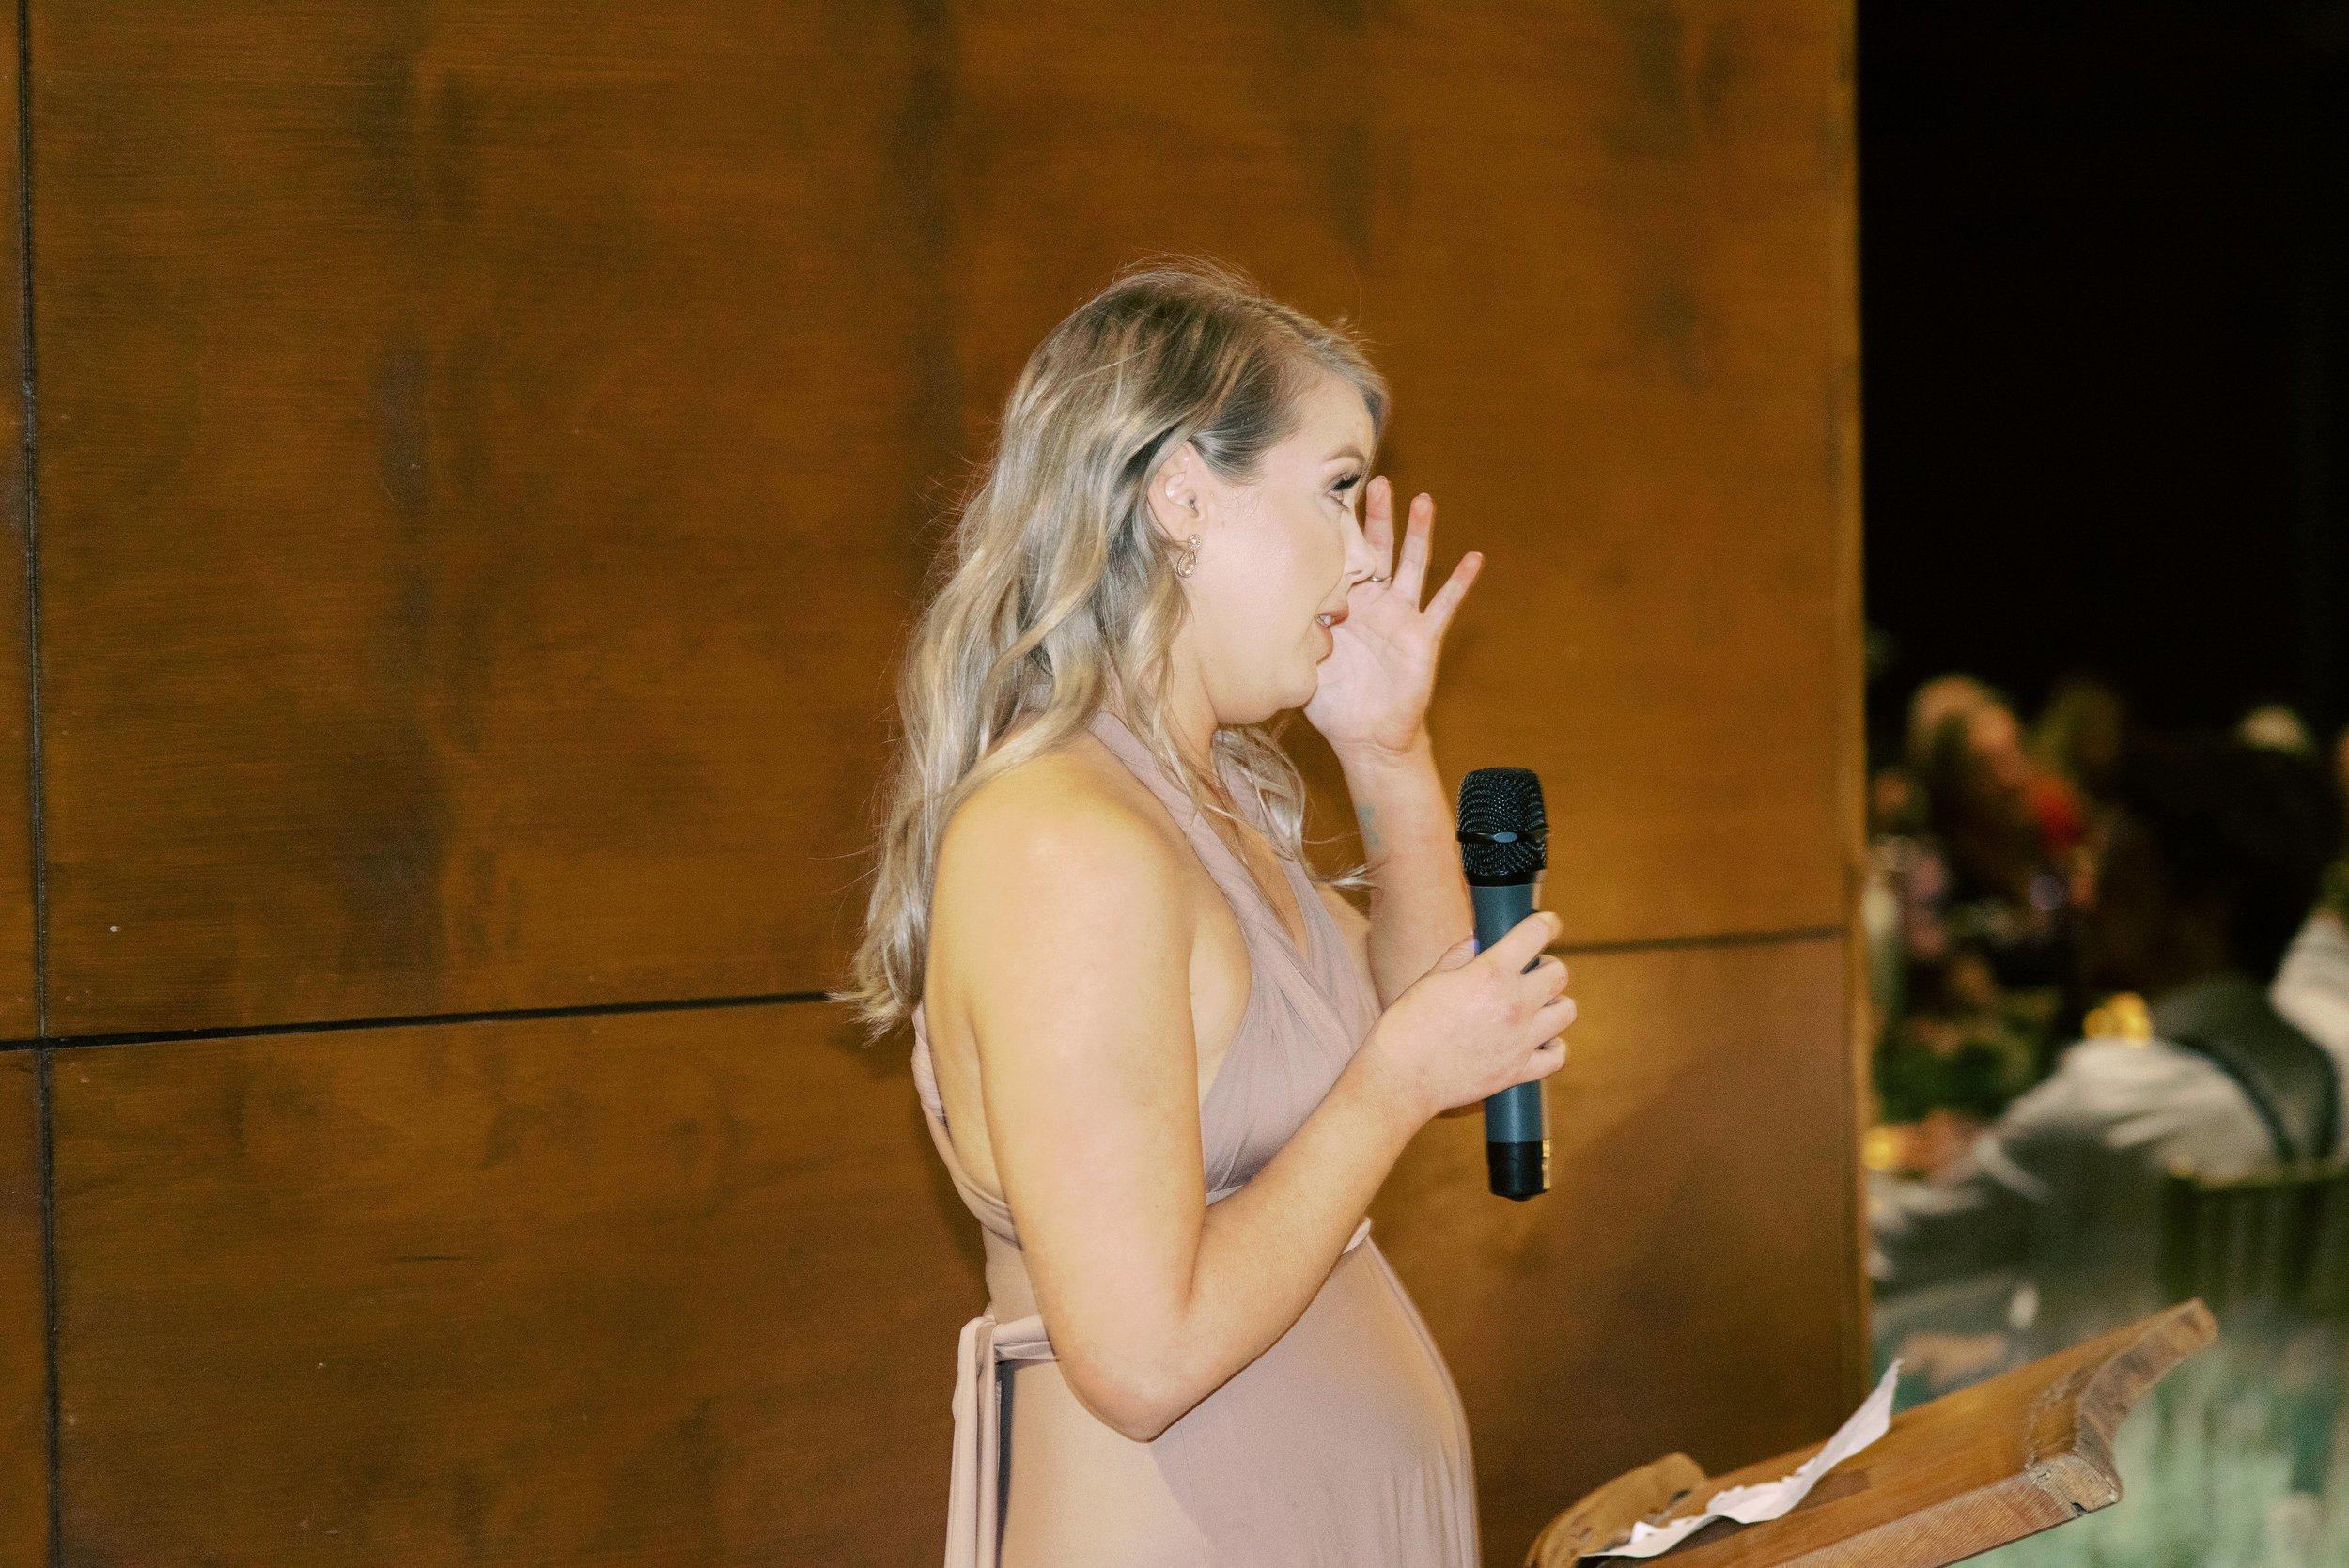 Kooroomba-Vineyard-Lavender-Farm-Wedding-Fine-Art-Lauren-Olivia-77.jpg